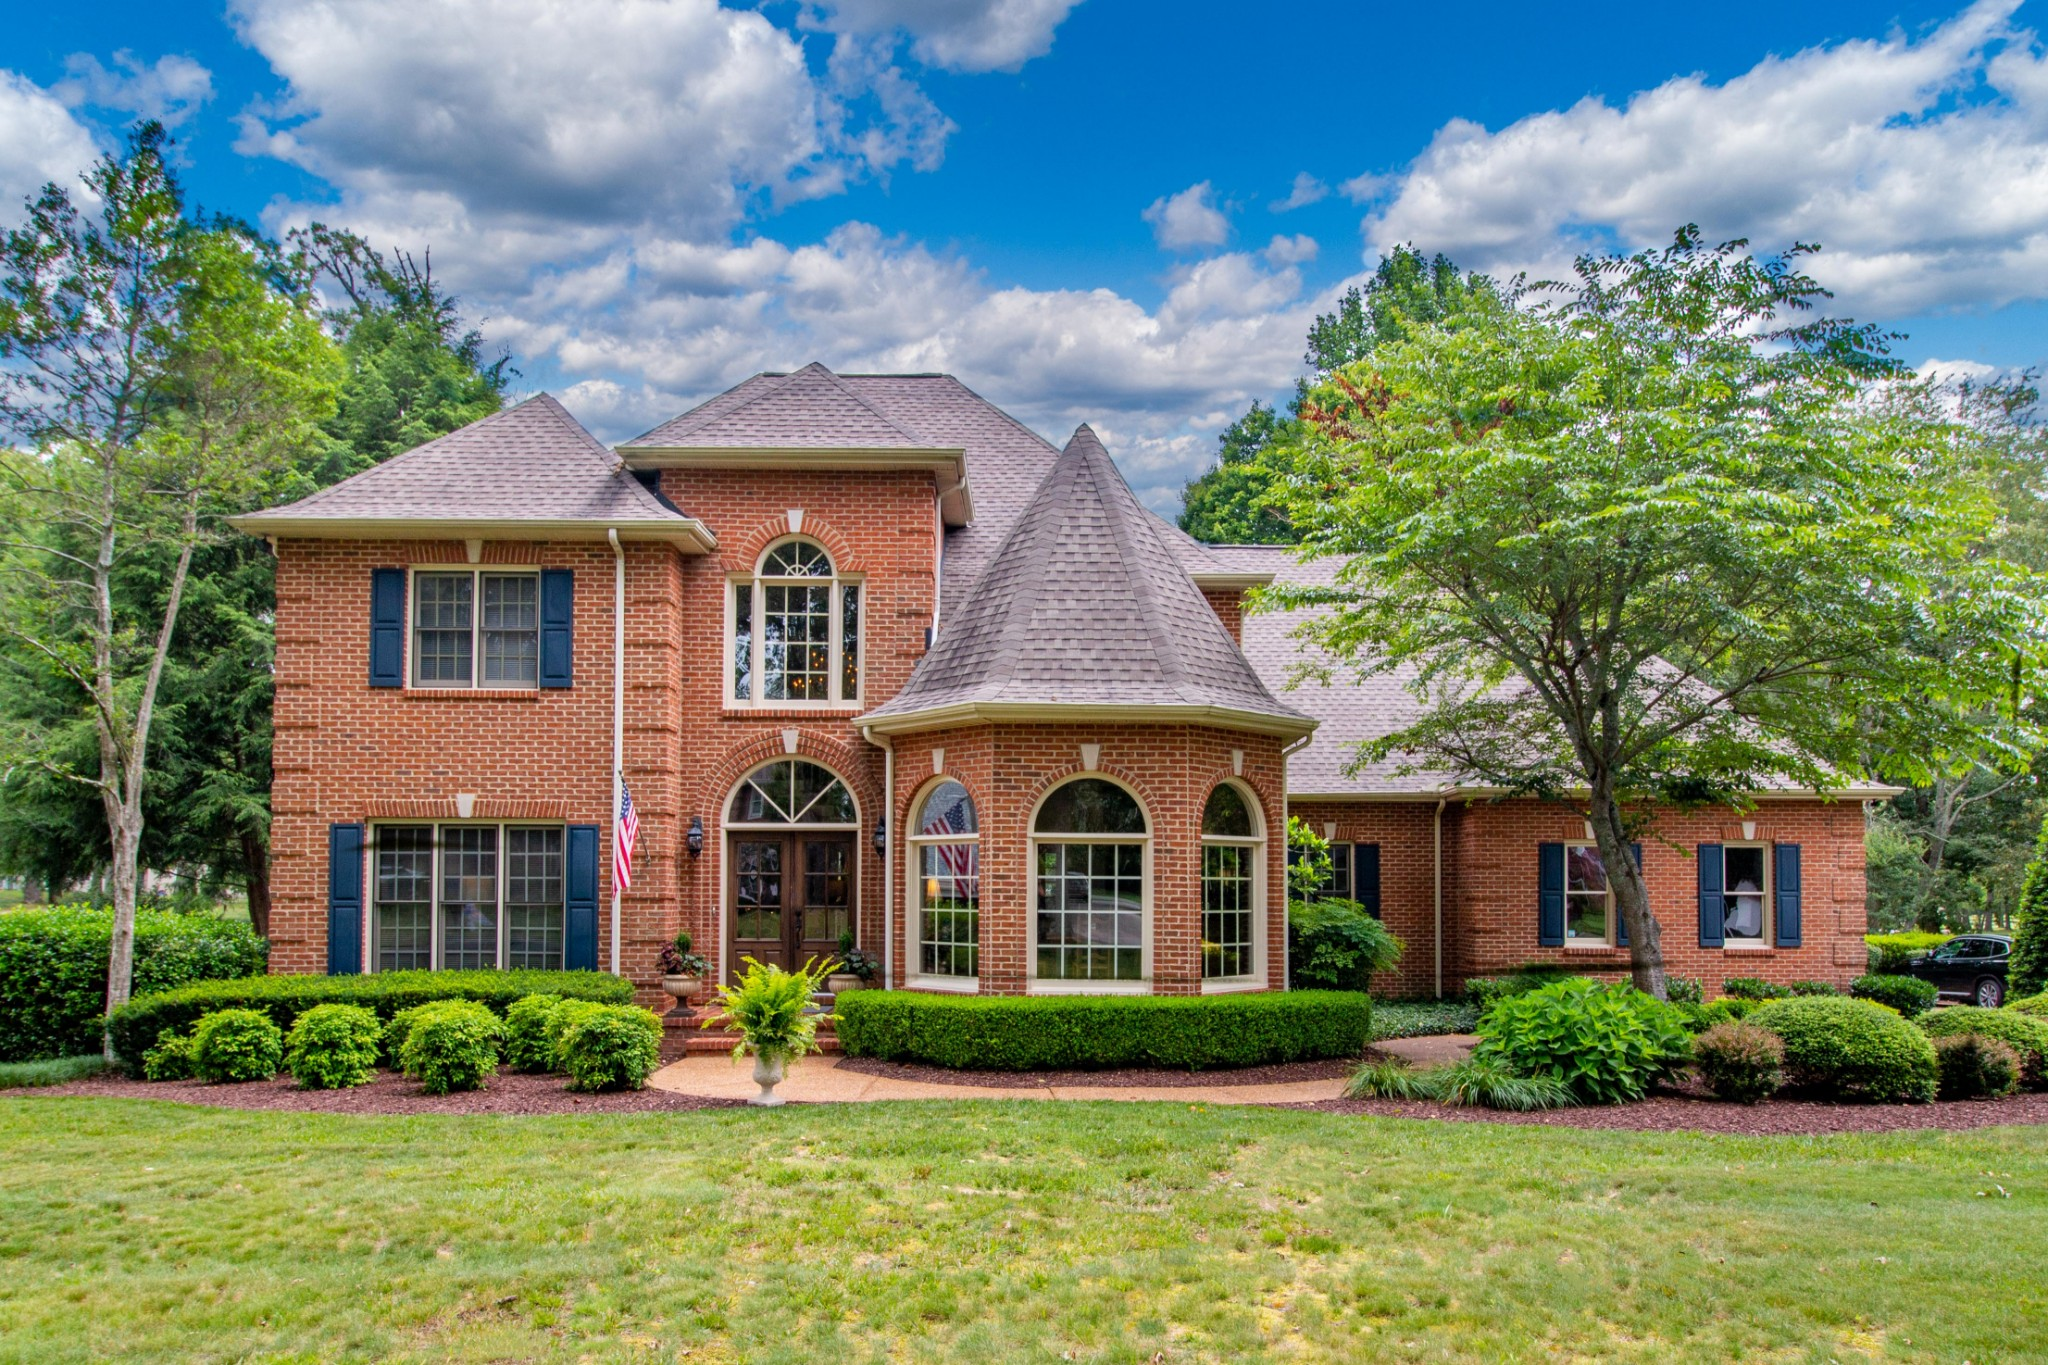 206 Fairways Blvd, N Property Photo - Tullahoma, TN real estate listing